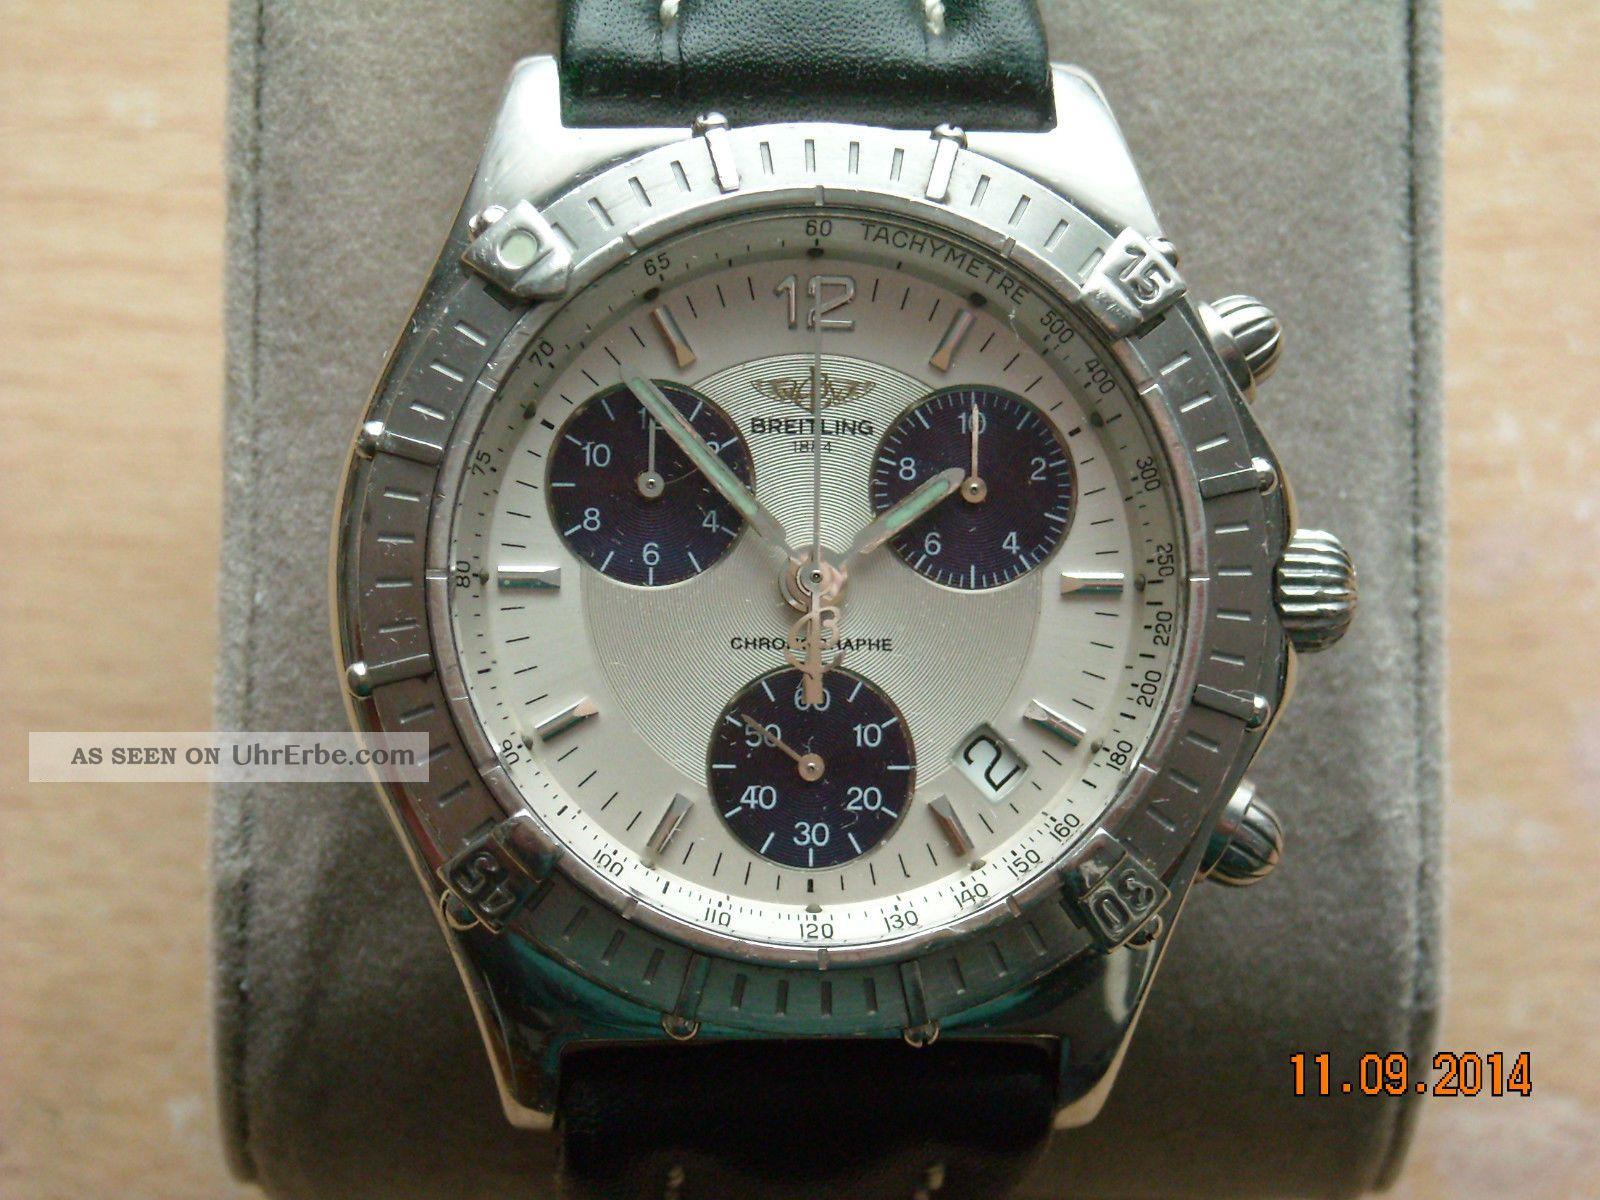 Breitling Chrono Sirius Model A53011 Armbanduhren Bild